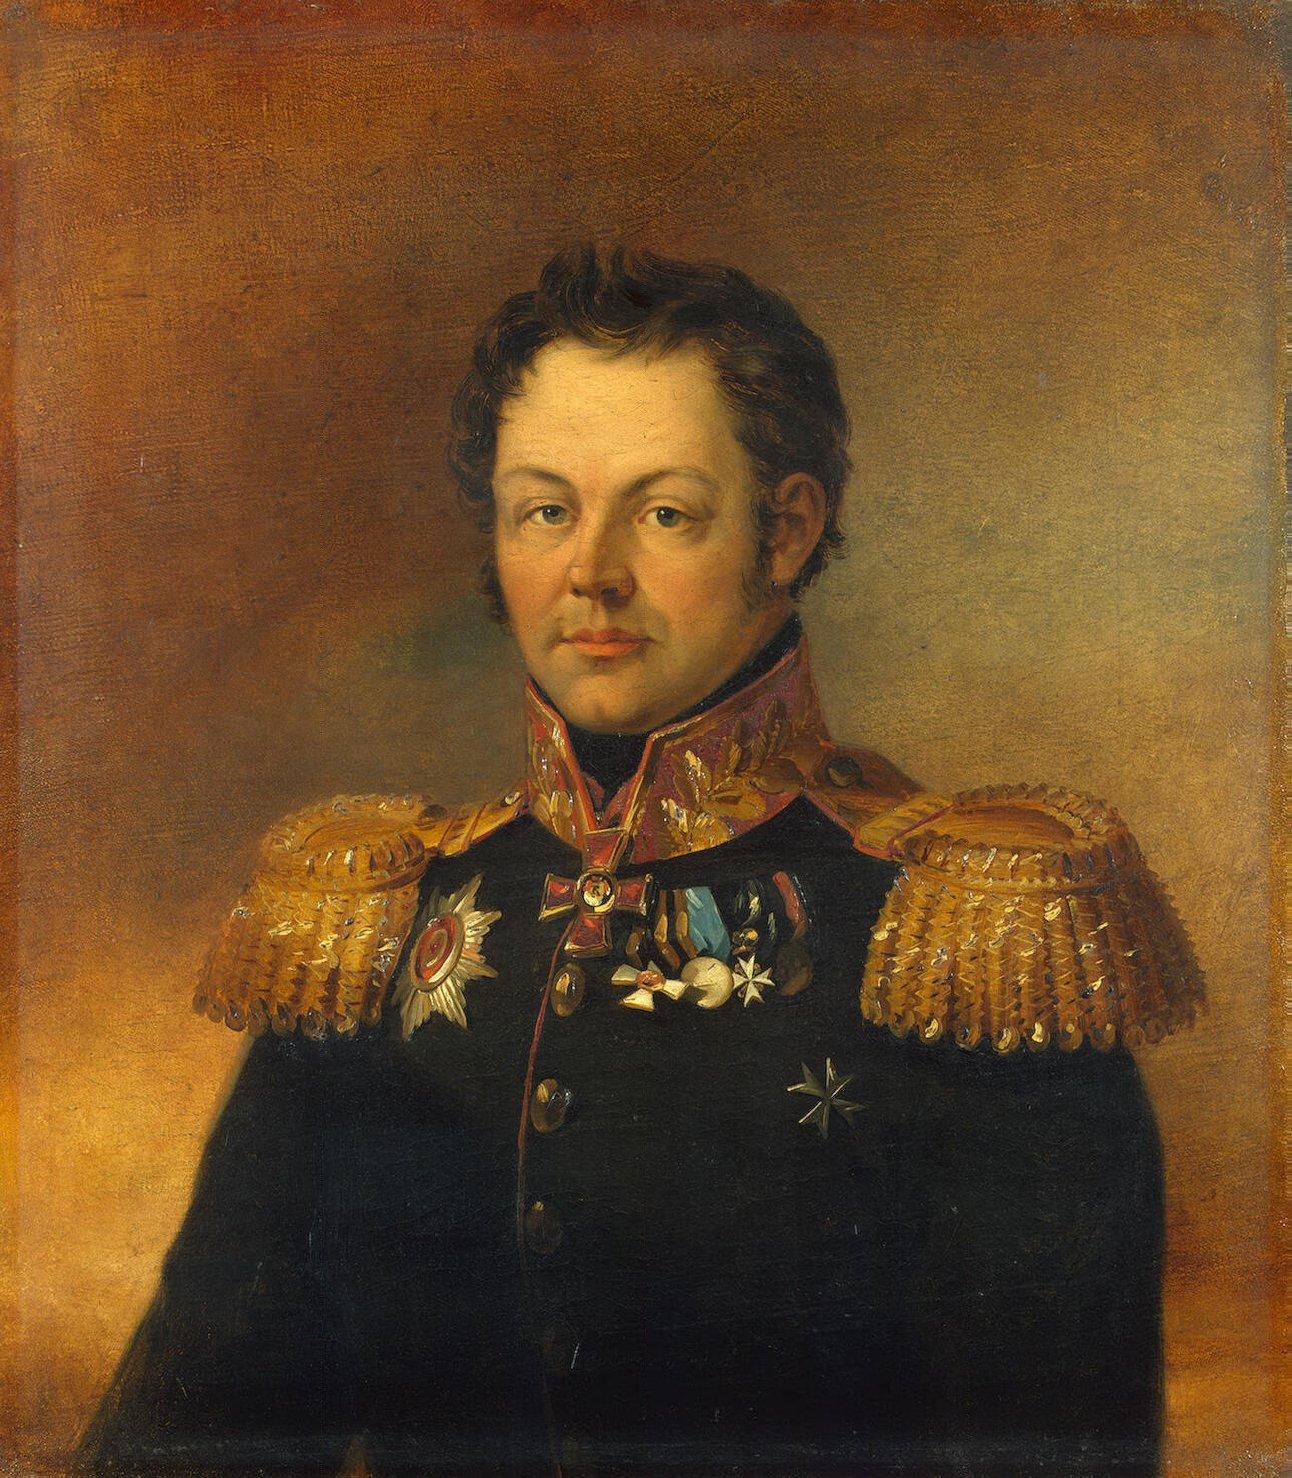 Пейкер, Александр Эммануилович